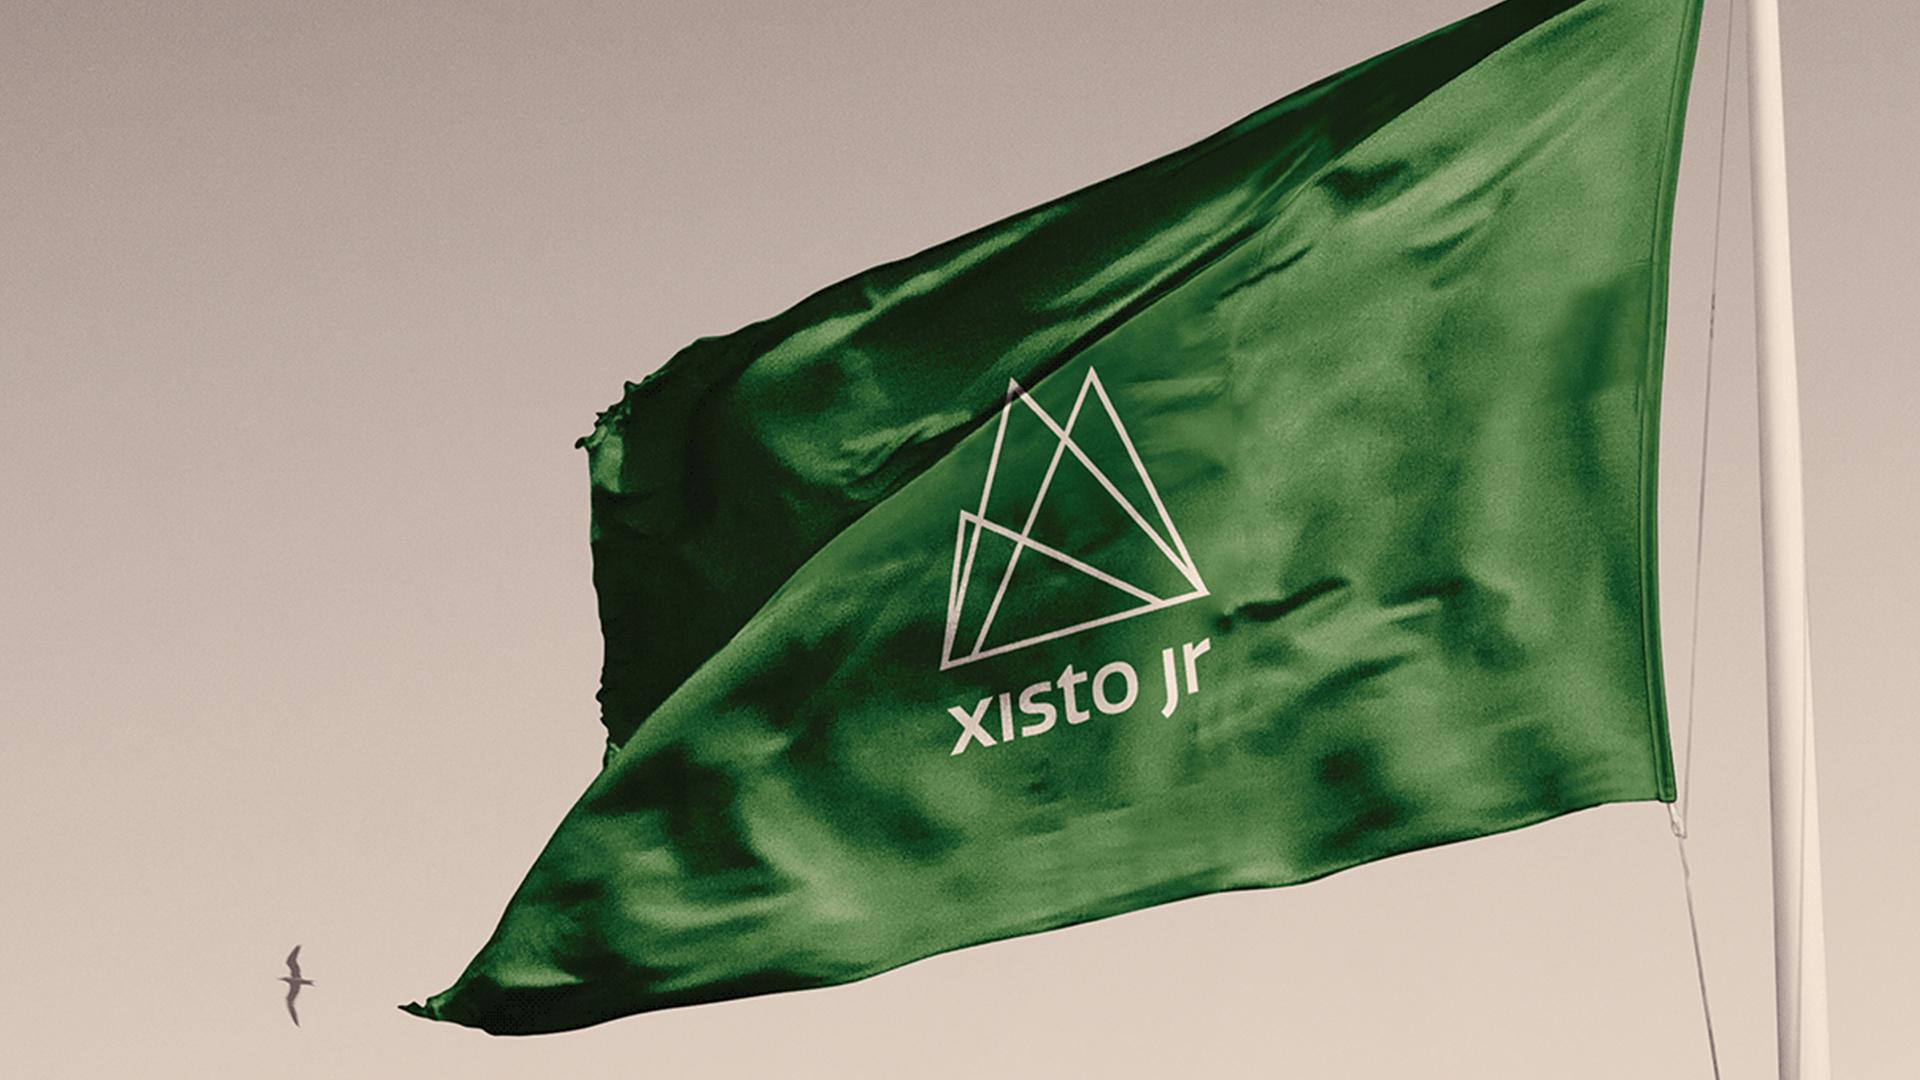 Xisto Jr